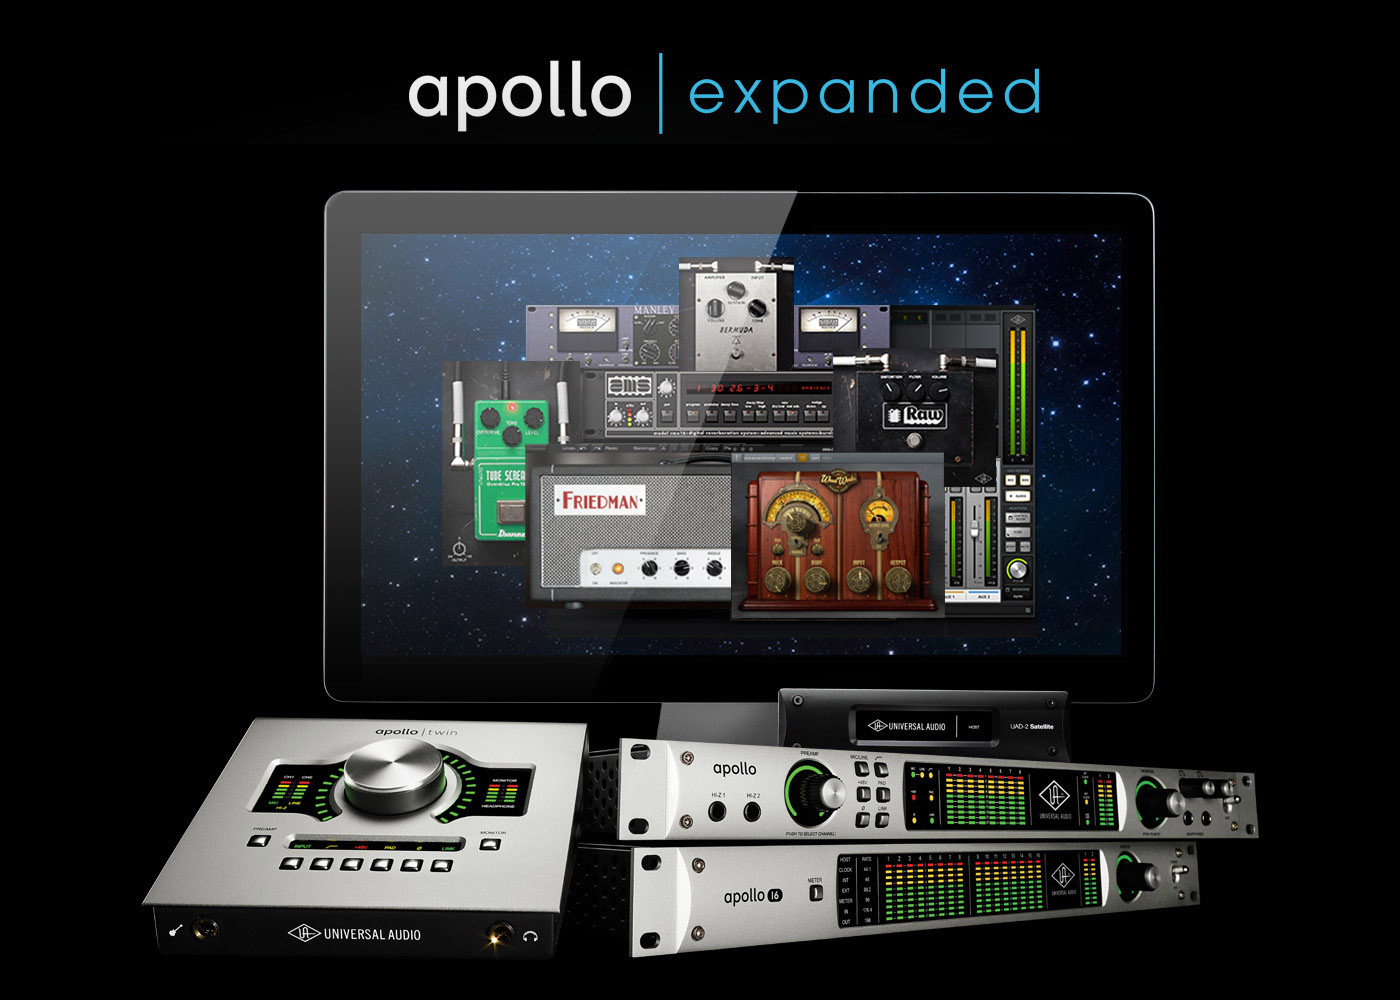 Apollo Expanded